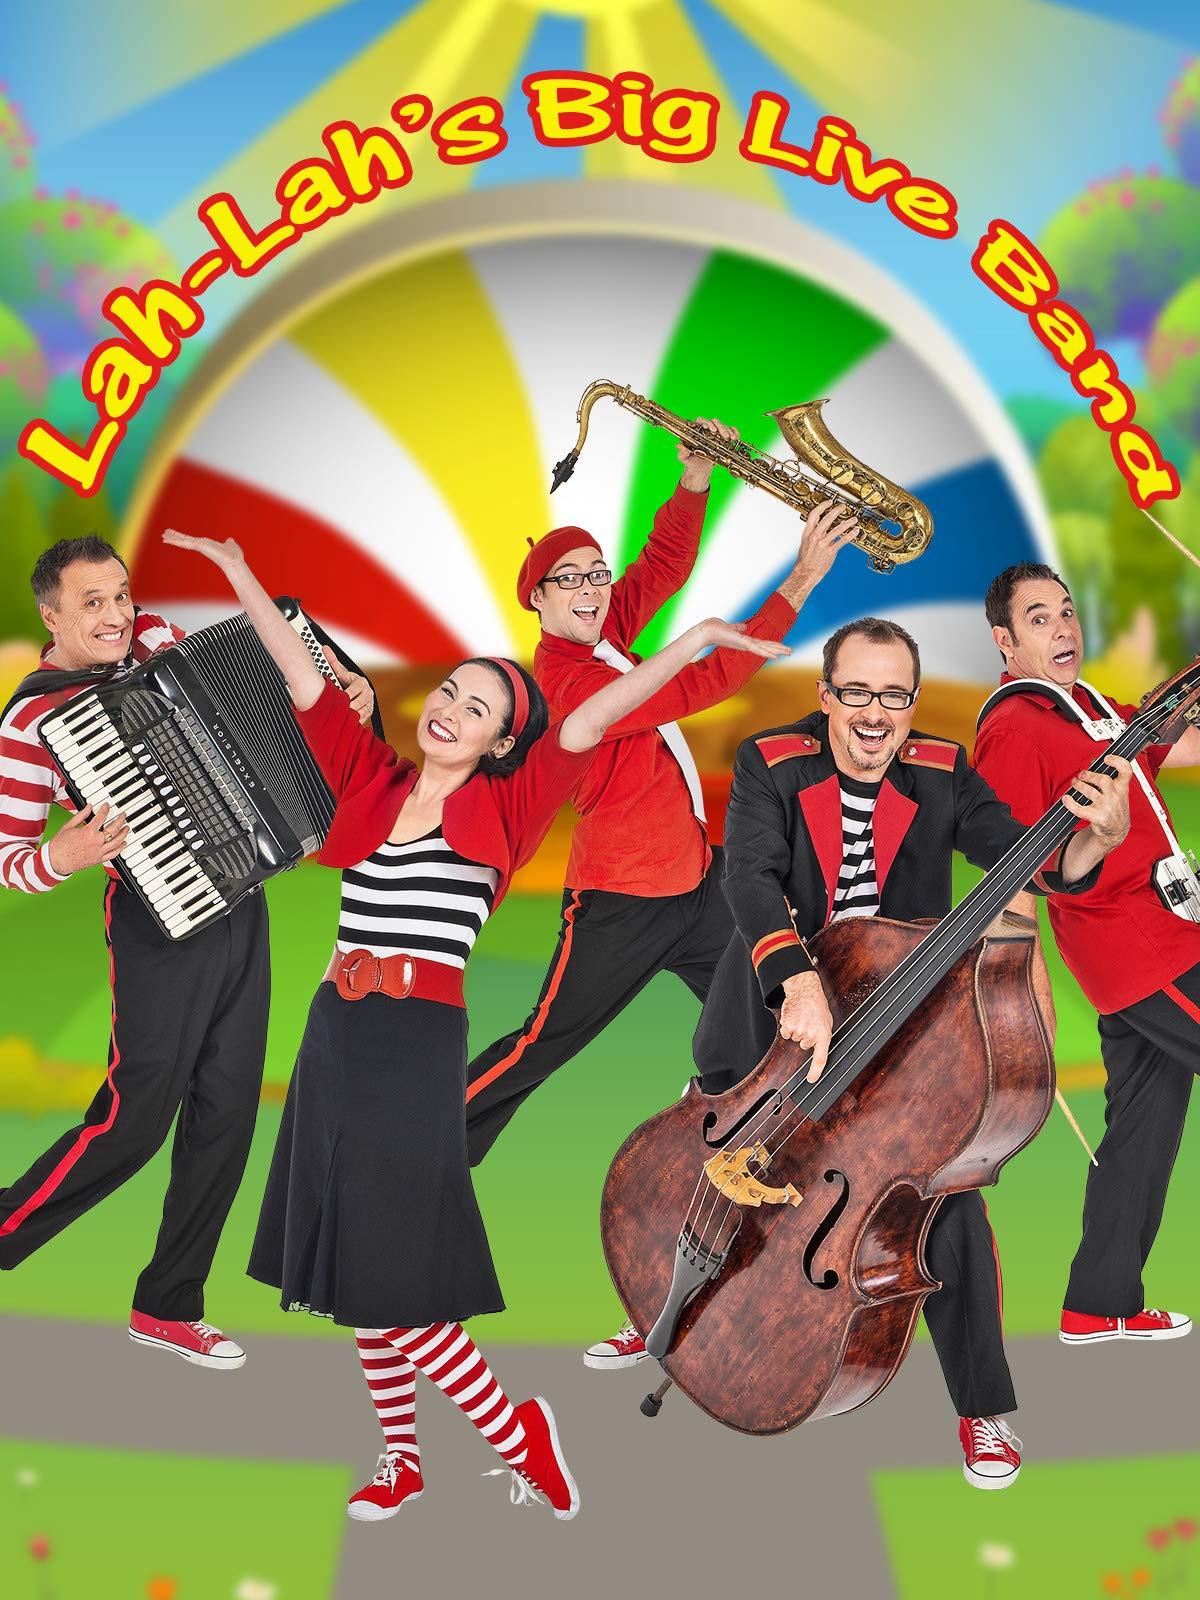 Lah-Lah's Big Live Band